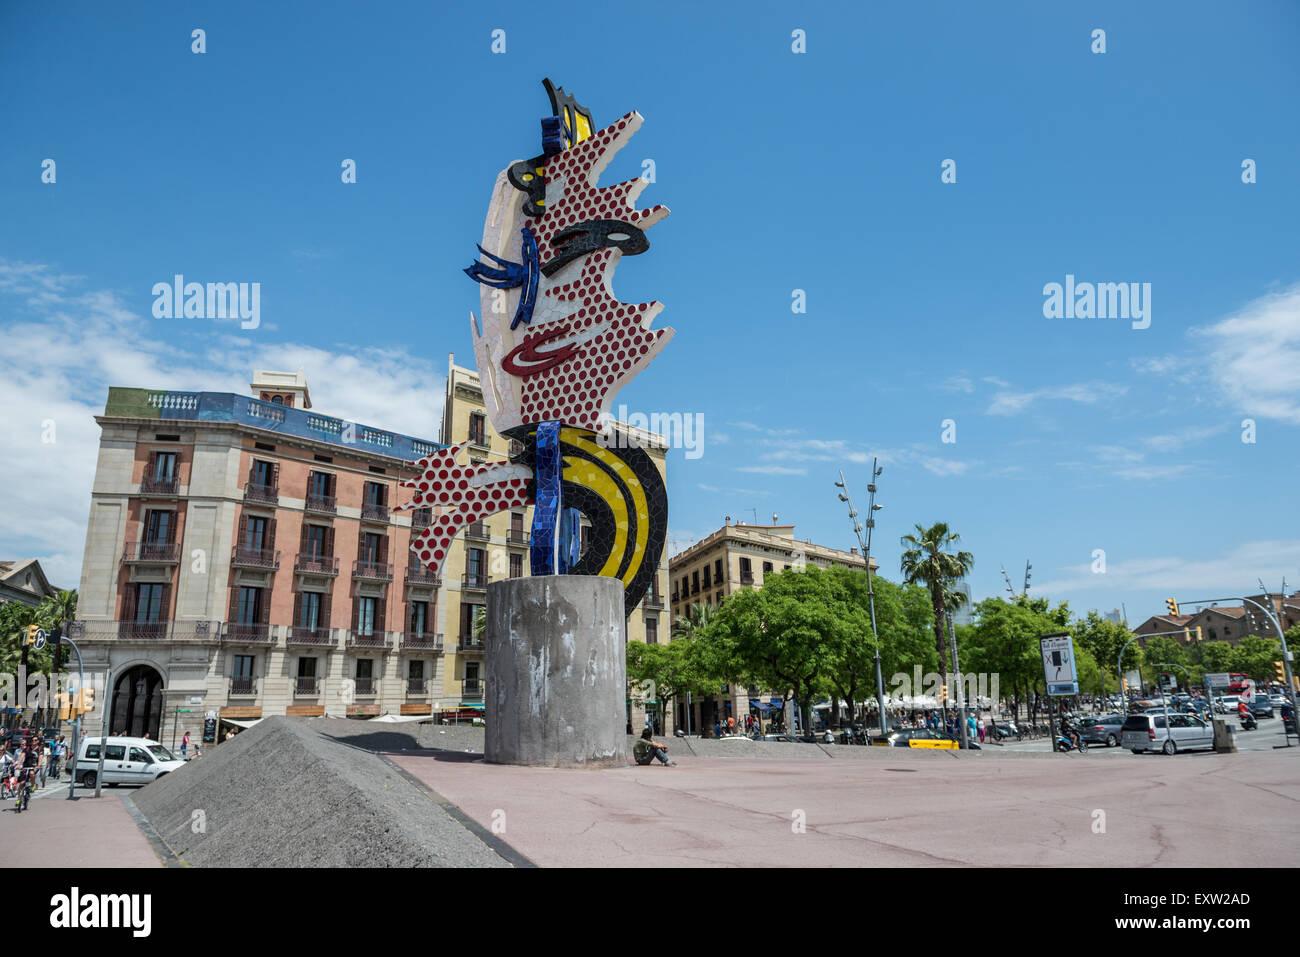 3093bfa7aee El Cap de Barcelona (The Head) surrealist sculpture by American artist Roy  Lichtenstein in Barcelona